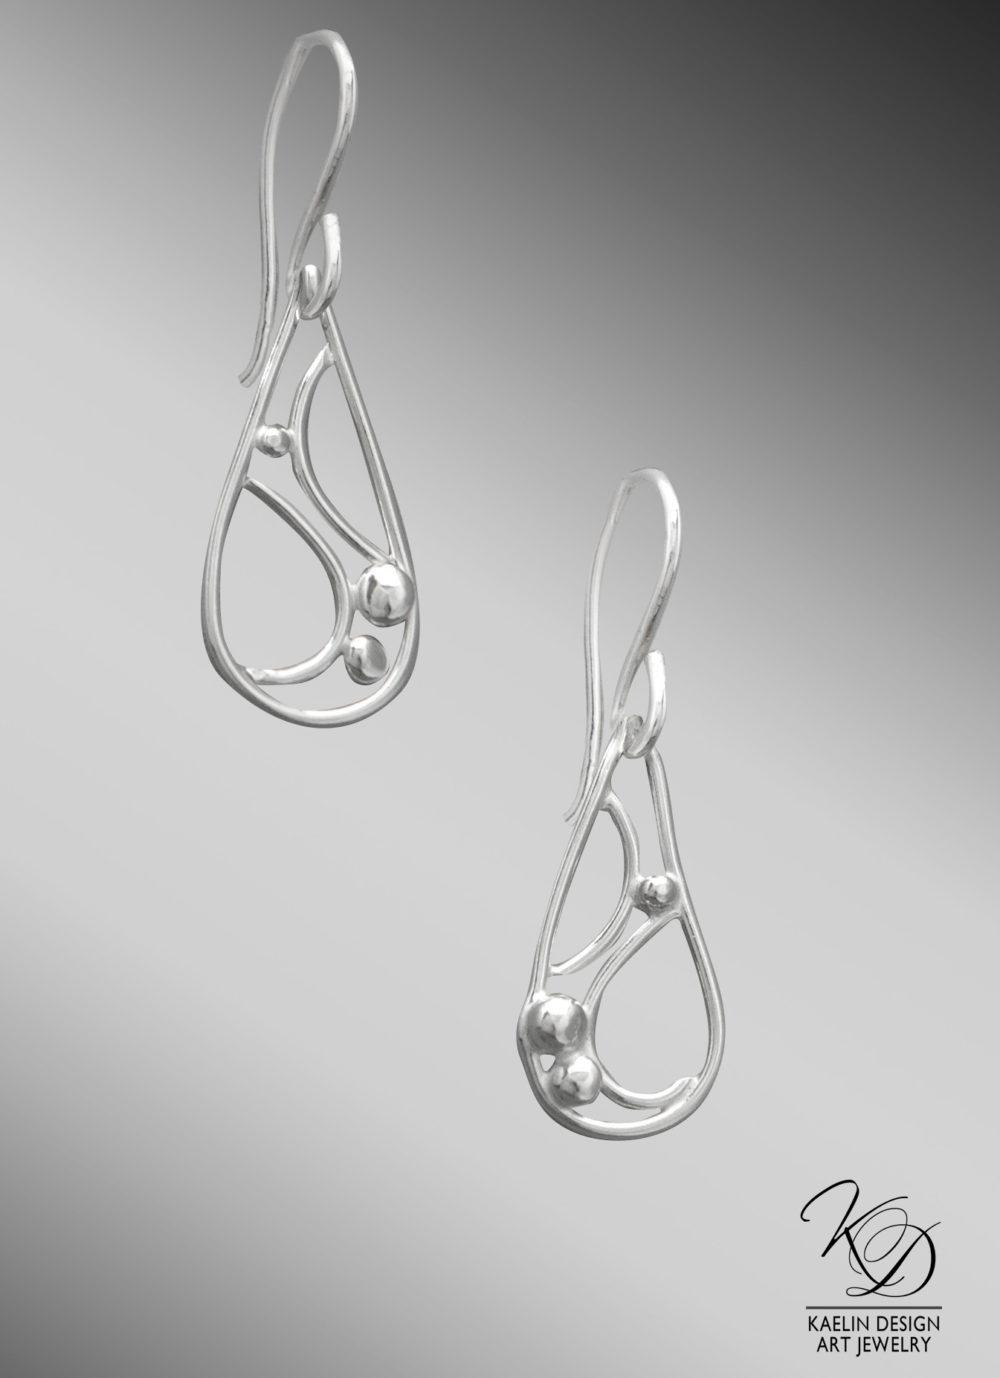 Rippling Currents Ocean Inspired Silver Earrings by Kaelin Design